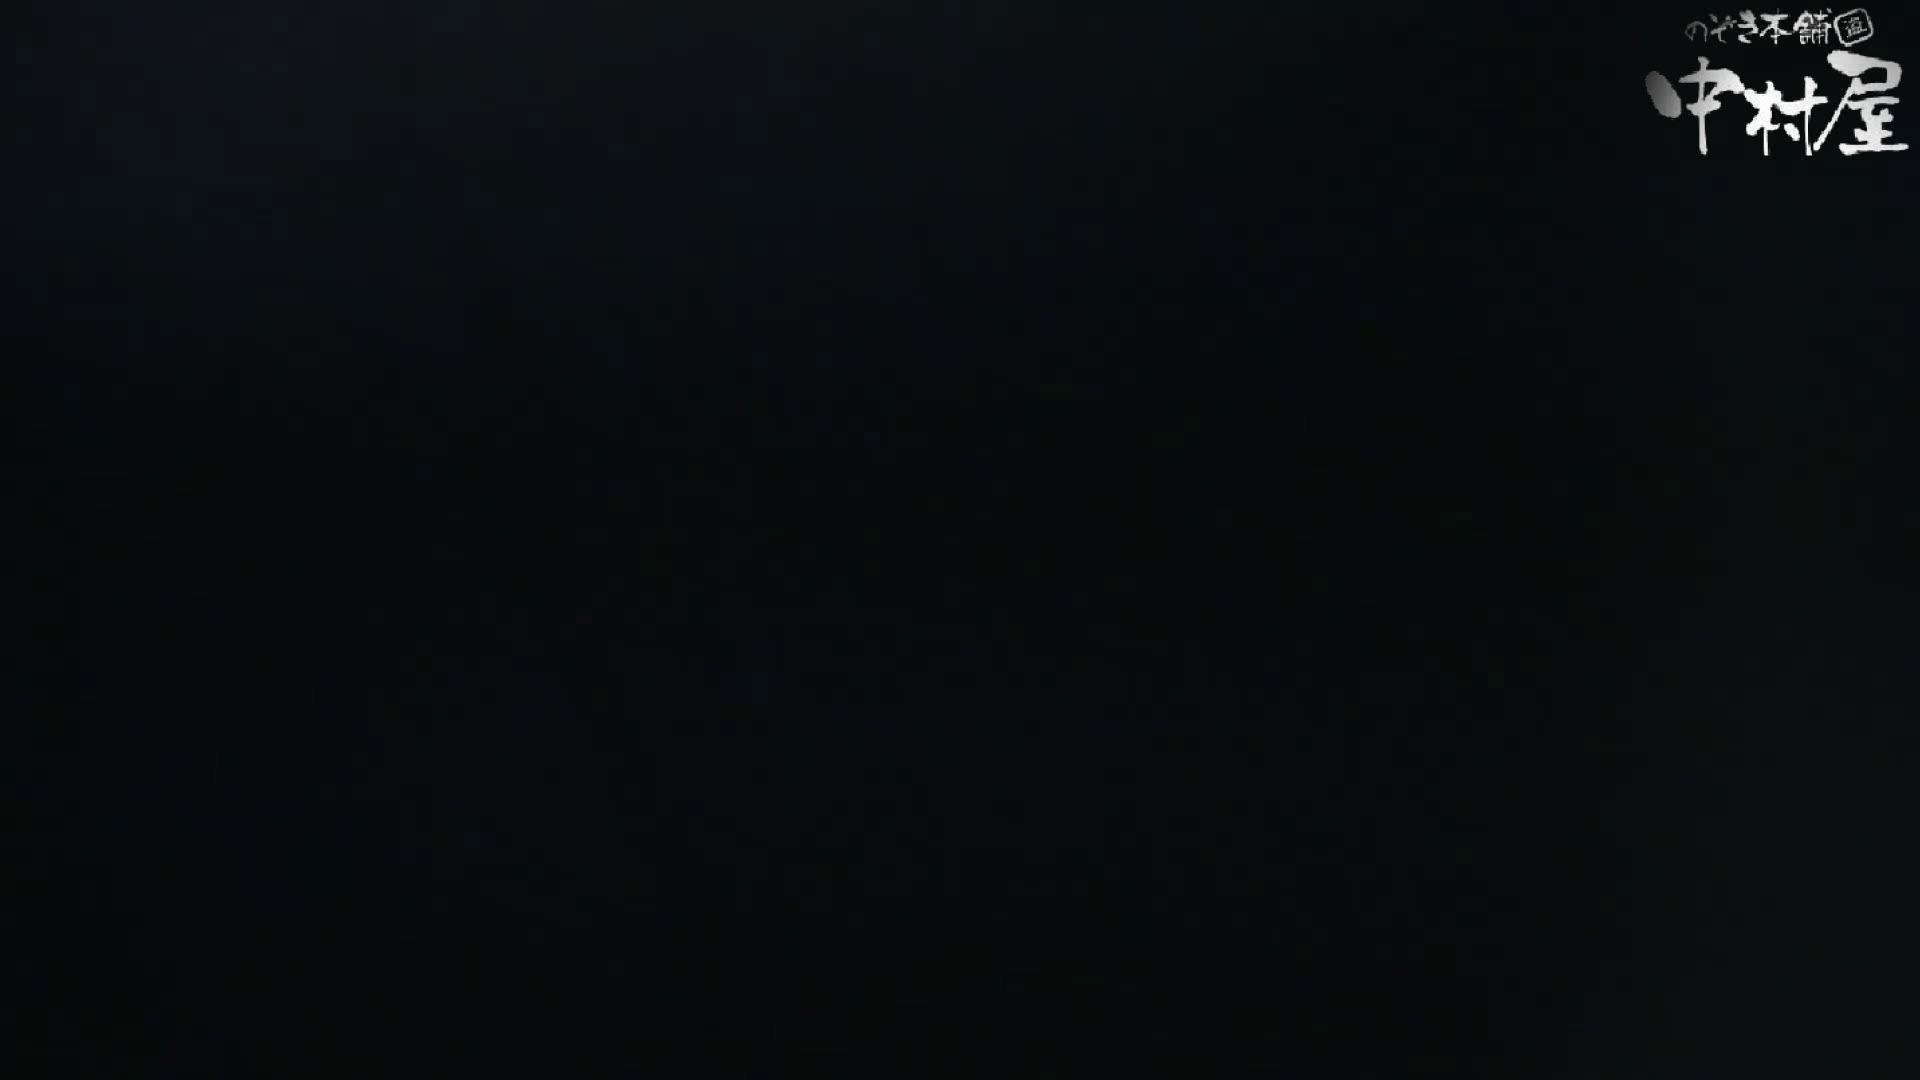 GOD HAND 芸術大学盗撮‼vol.79 OLのエロ生活 隠し撮りオマンコ動画紹介 107連発 106